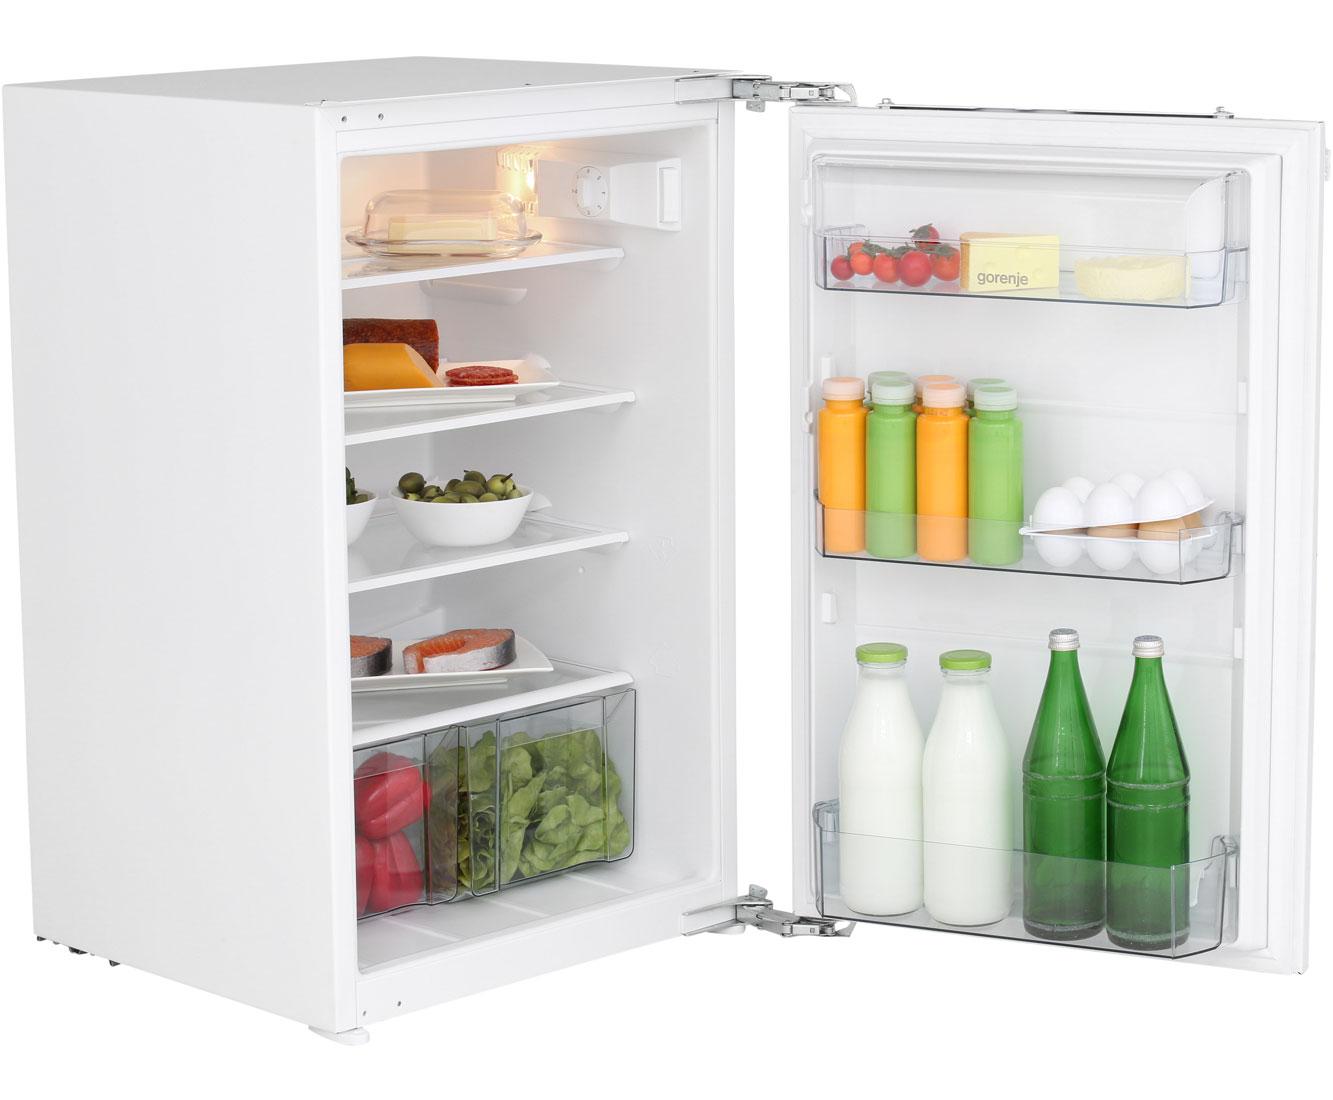 Gorenje Kühlschrank : Gorenje ri5092aw einbau kühlschrank 88er nische festtür technik a